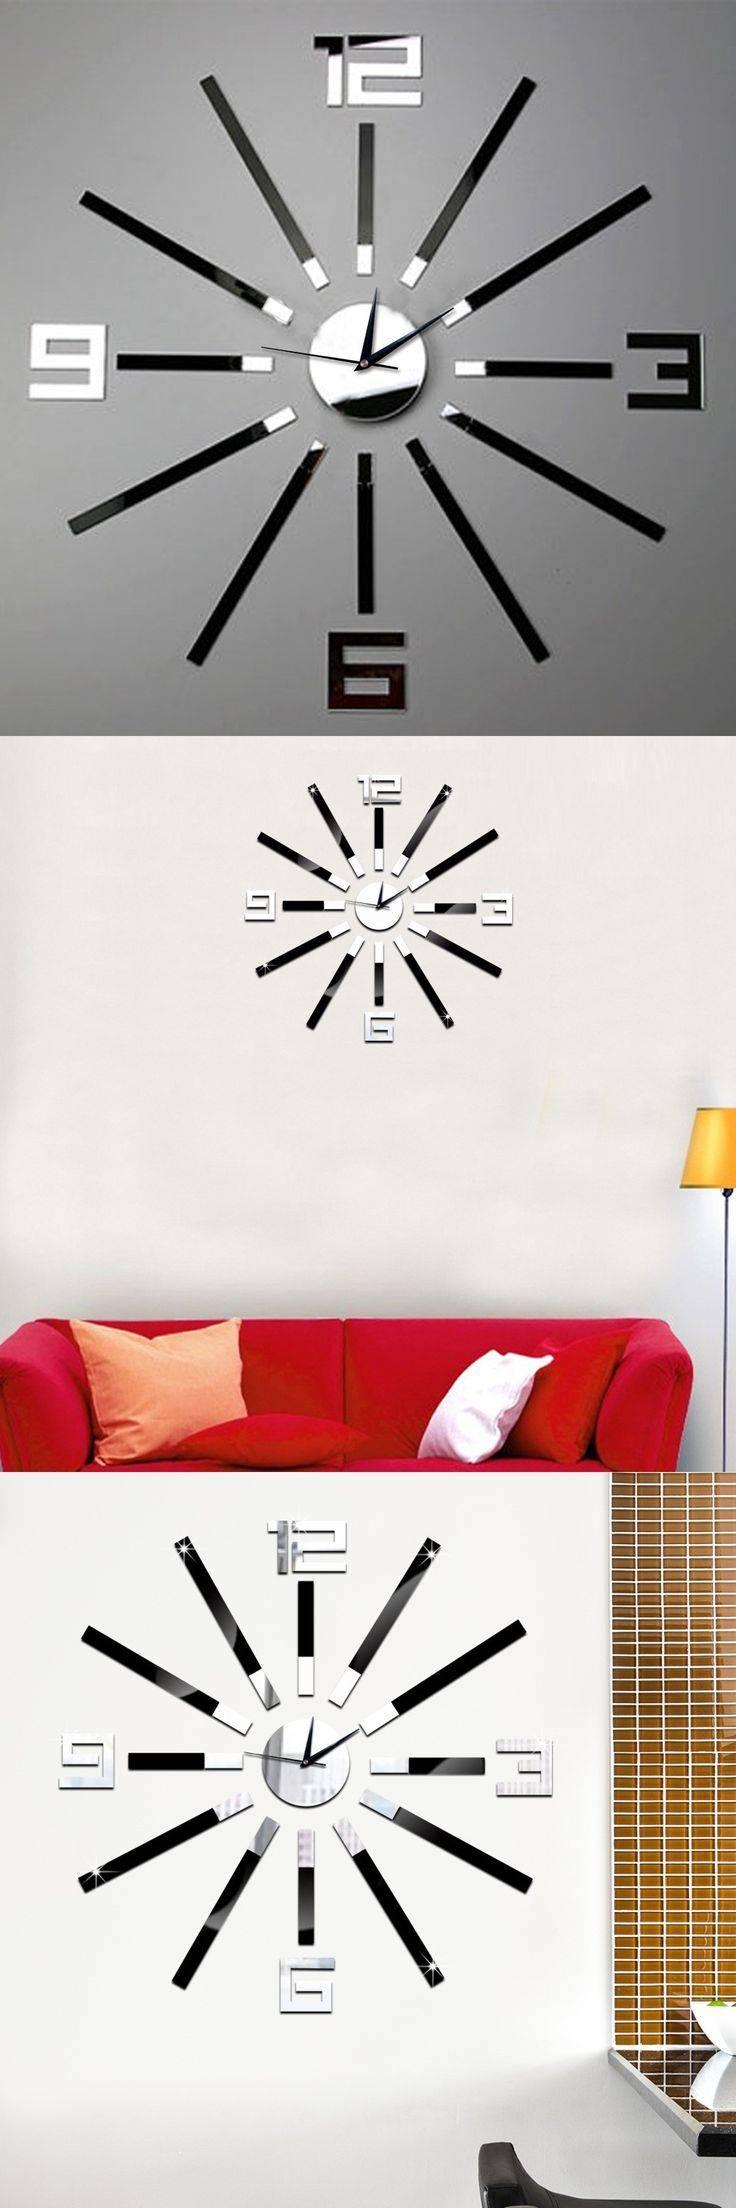 Best 25+ Mirror Wall Clock Ideas On Pinterest | Unique Wall Clocks Inside Most Popular Italian Ceramic Wall Clock Decors (View 2 of 25)